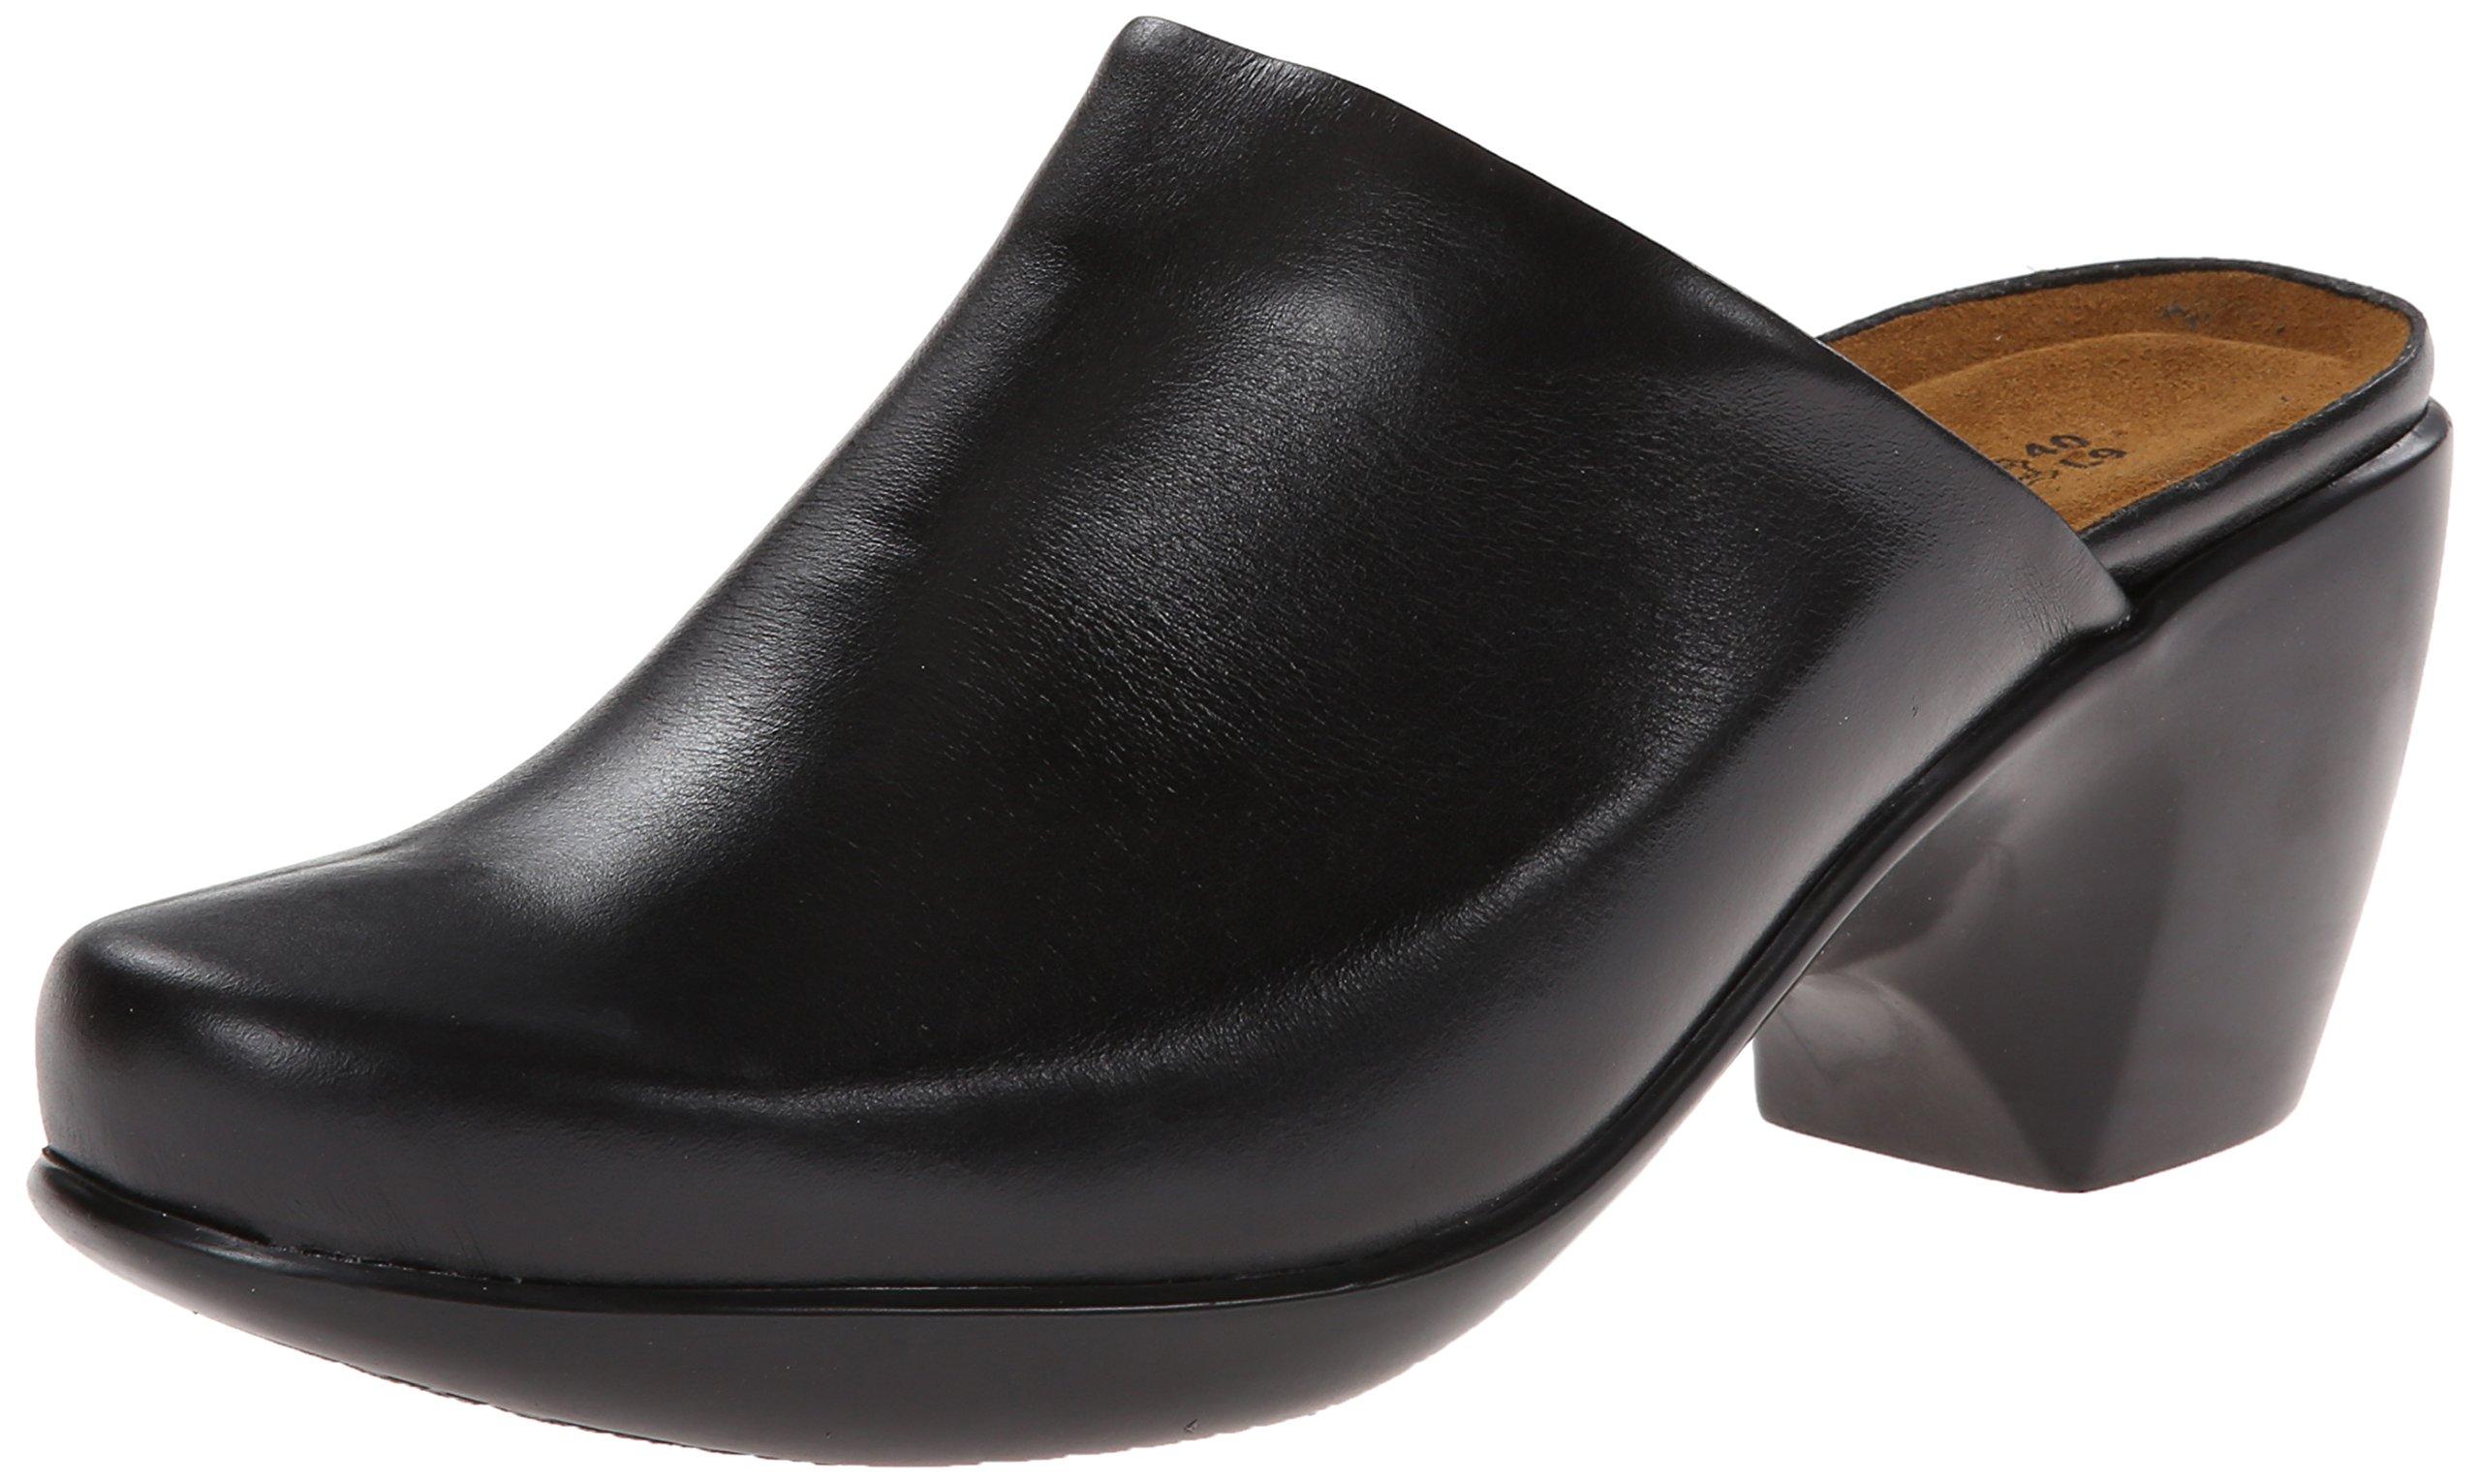 Naot Women's Dream Mule, Black Madras Leather, 38 EU/7 M US